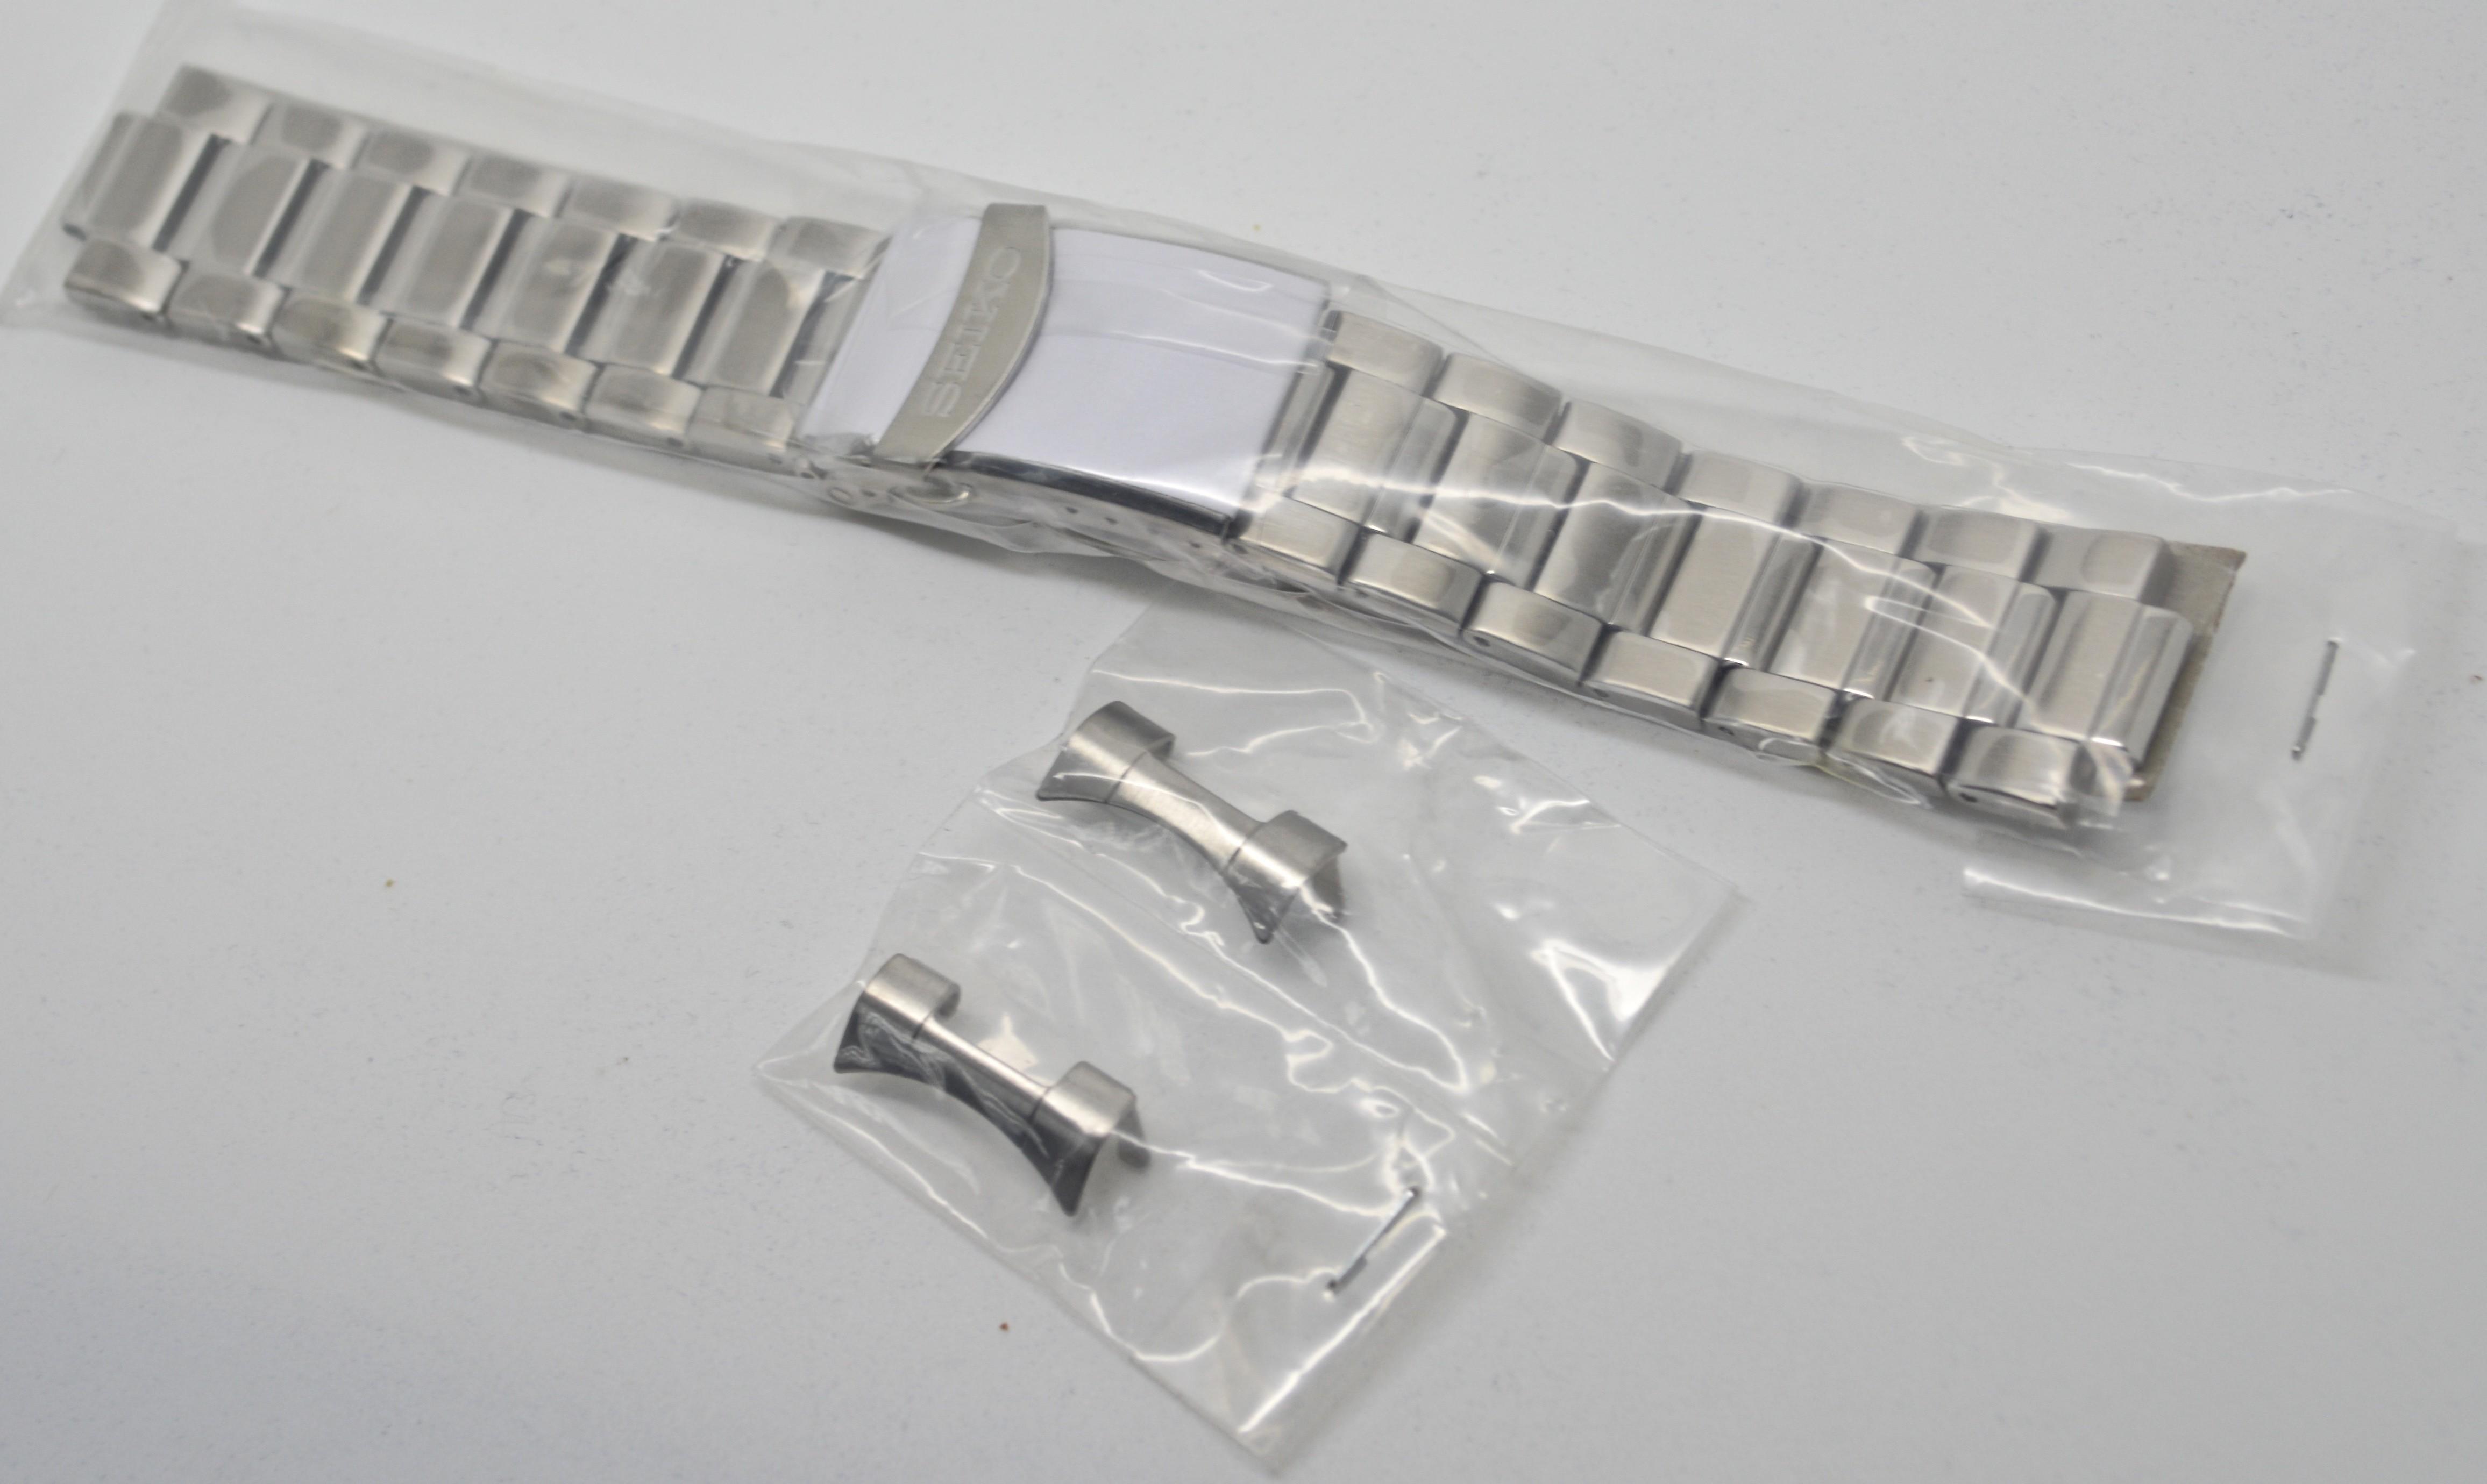 Seiko SNZH60 Seiko Automatic Diver Gold Black Dial Glassback